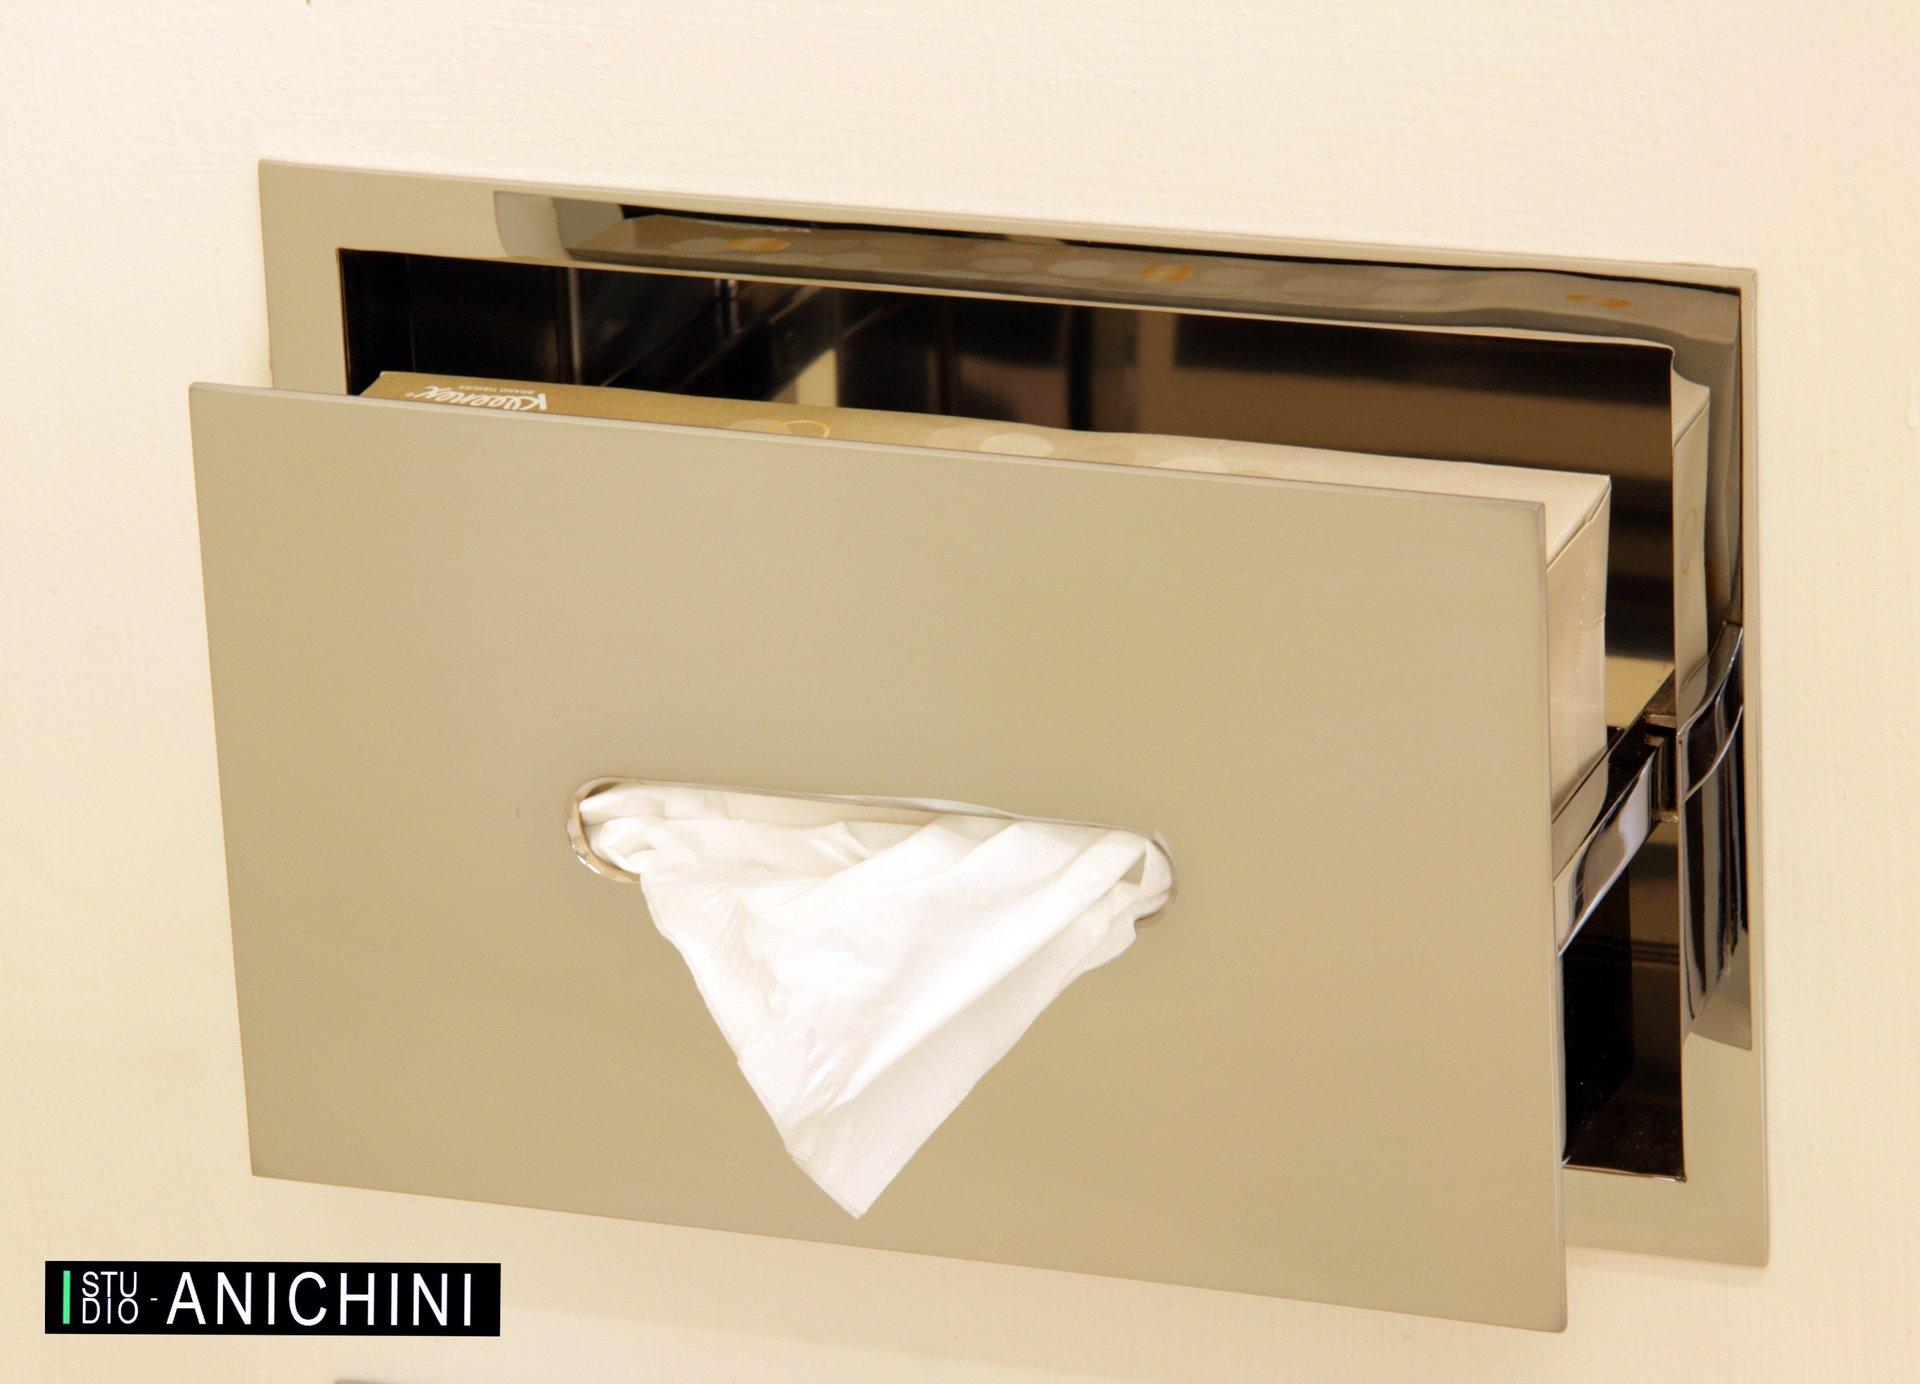 Accessori bagno da incasso firenze studio anichini - Accessori bagno in ceramica da incasso ...